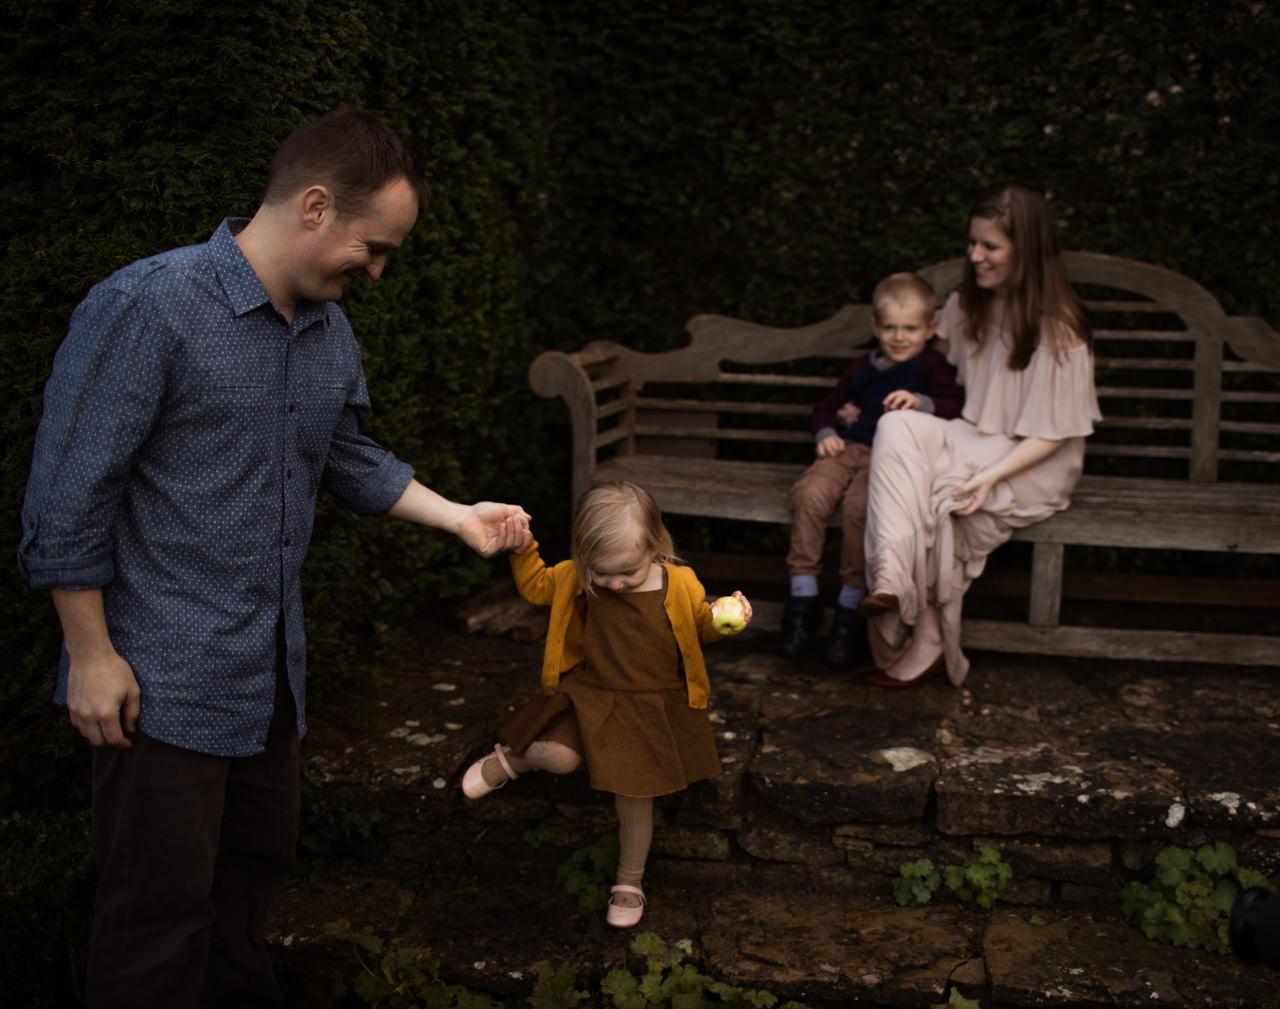 England Candid Family Portraits